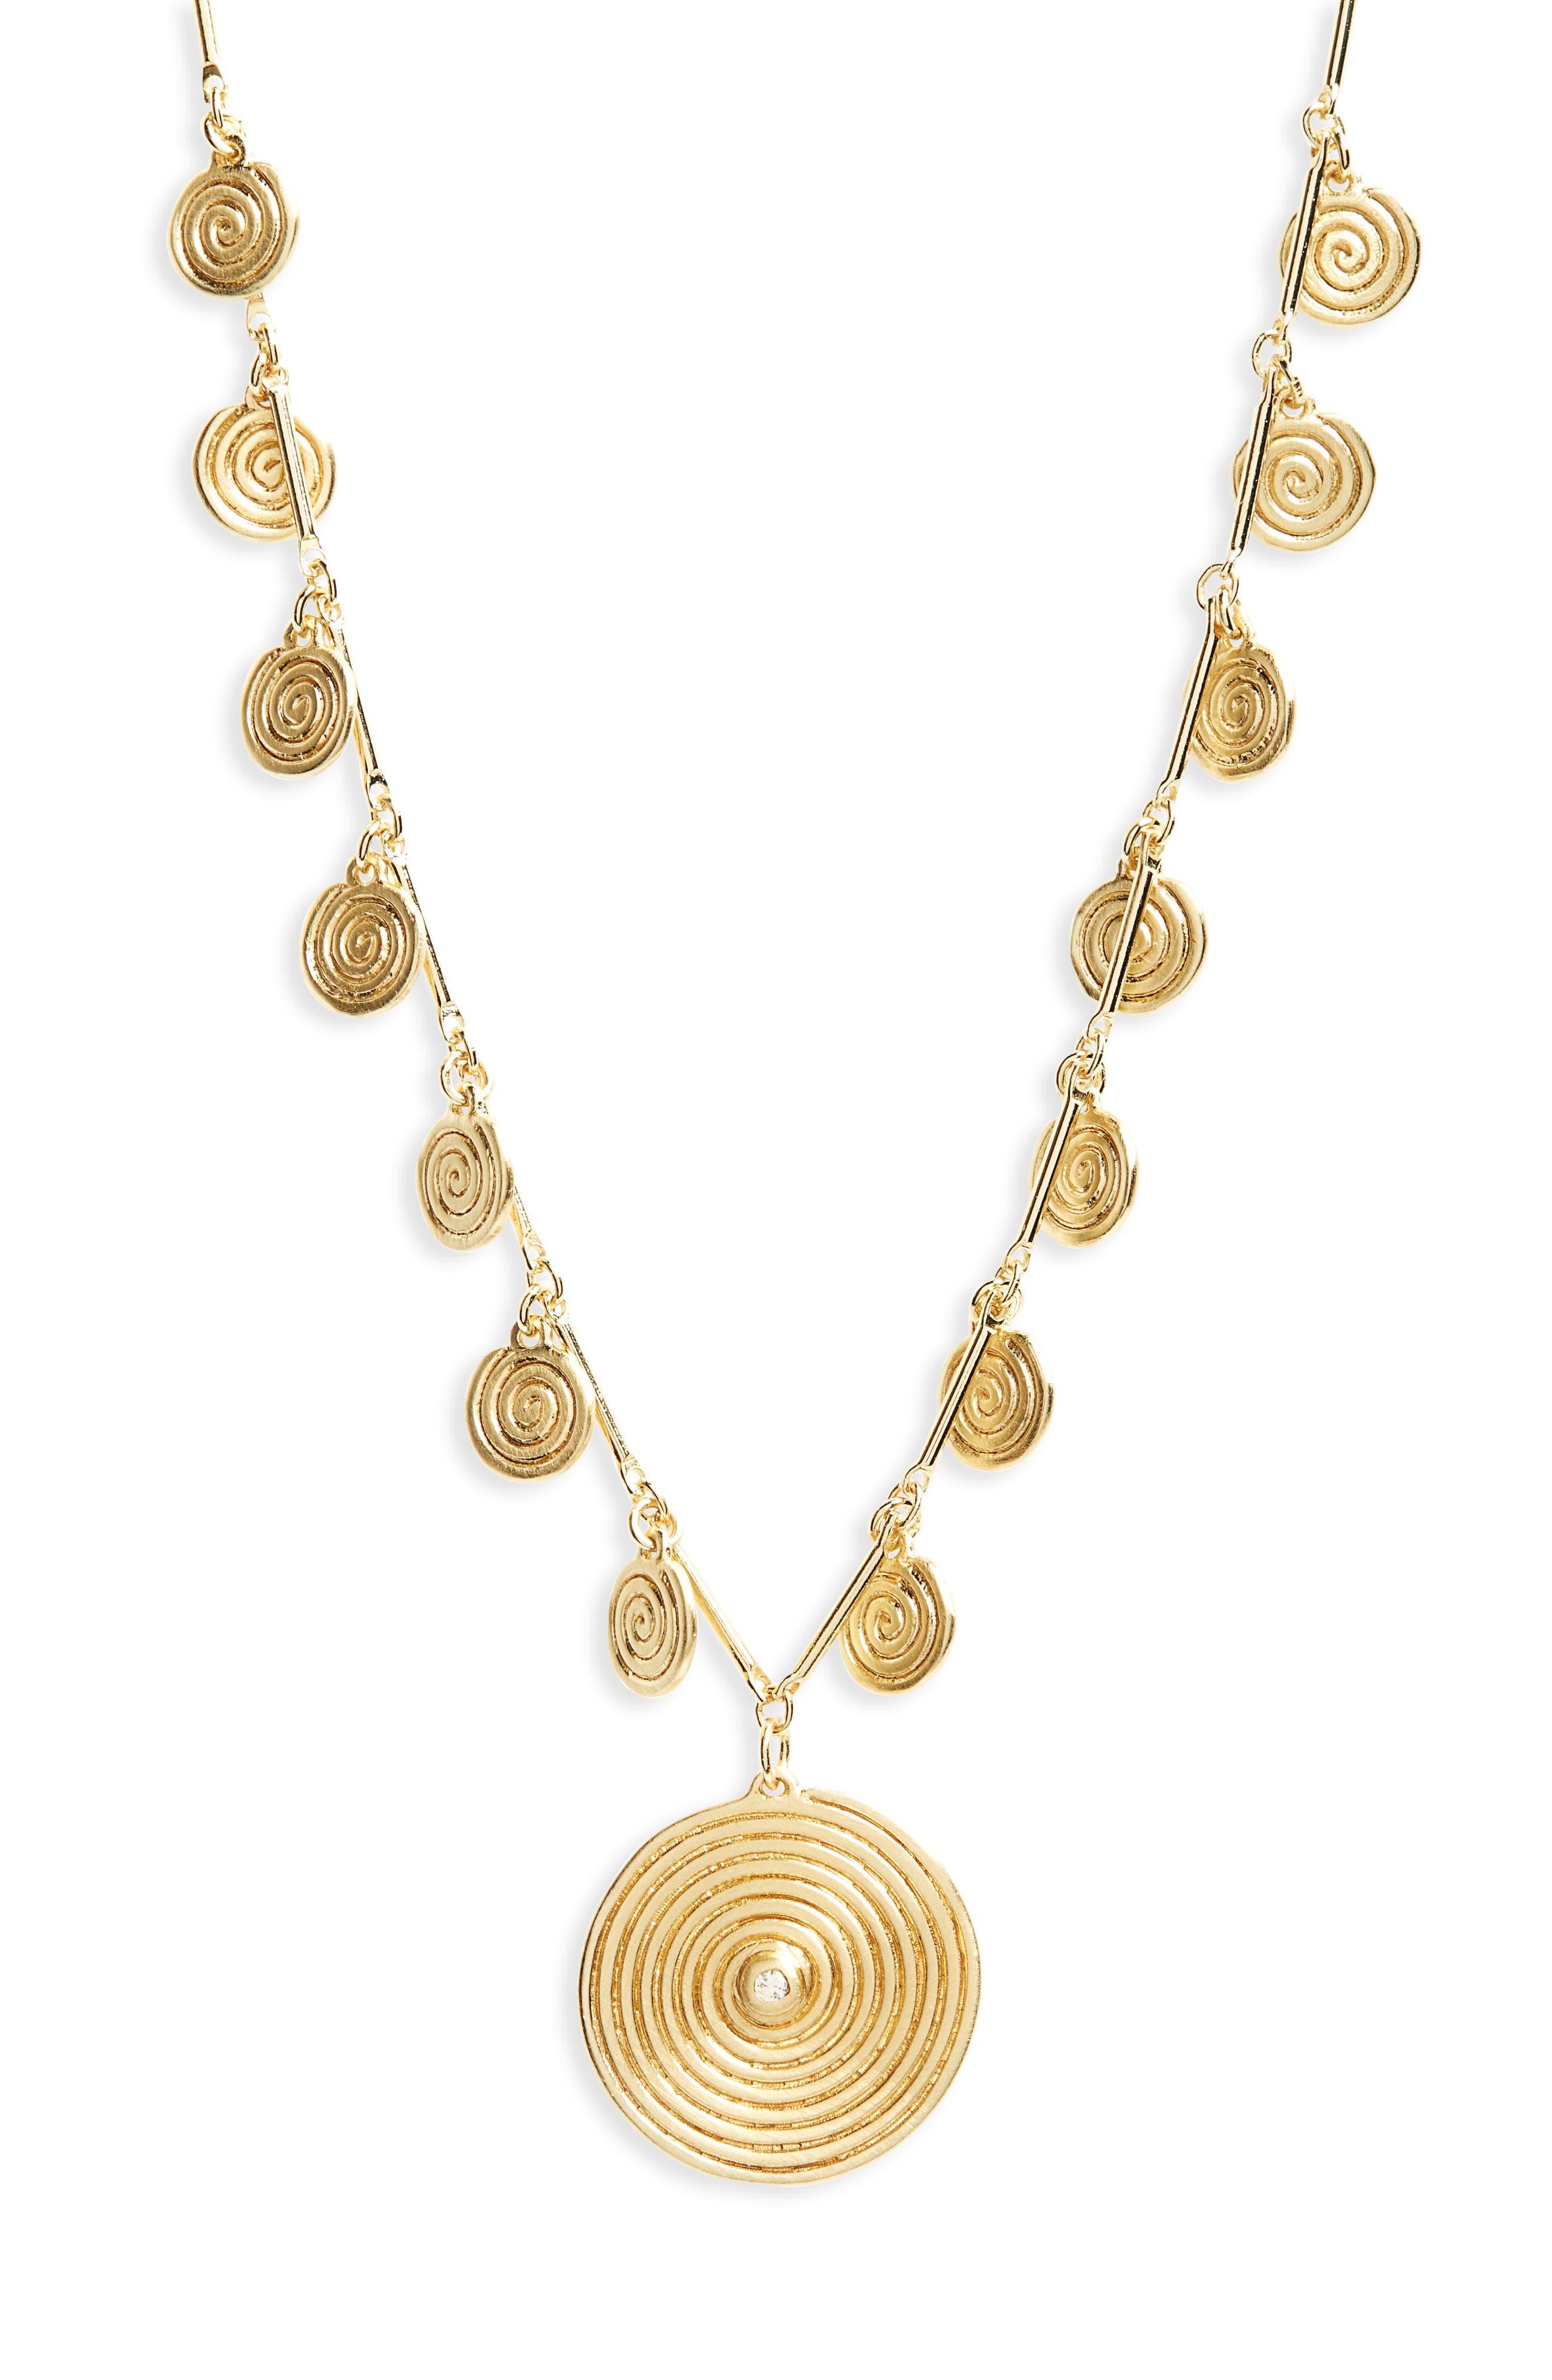 Sullivan - Ashlyn White Topaz Pendant Necklace,                             Alternate thumbnail 2, color,                             Yellow Gold